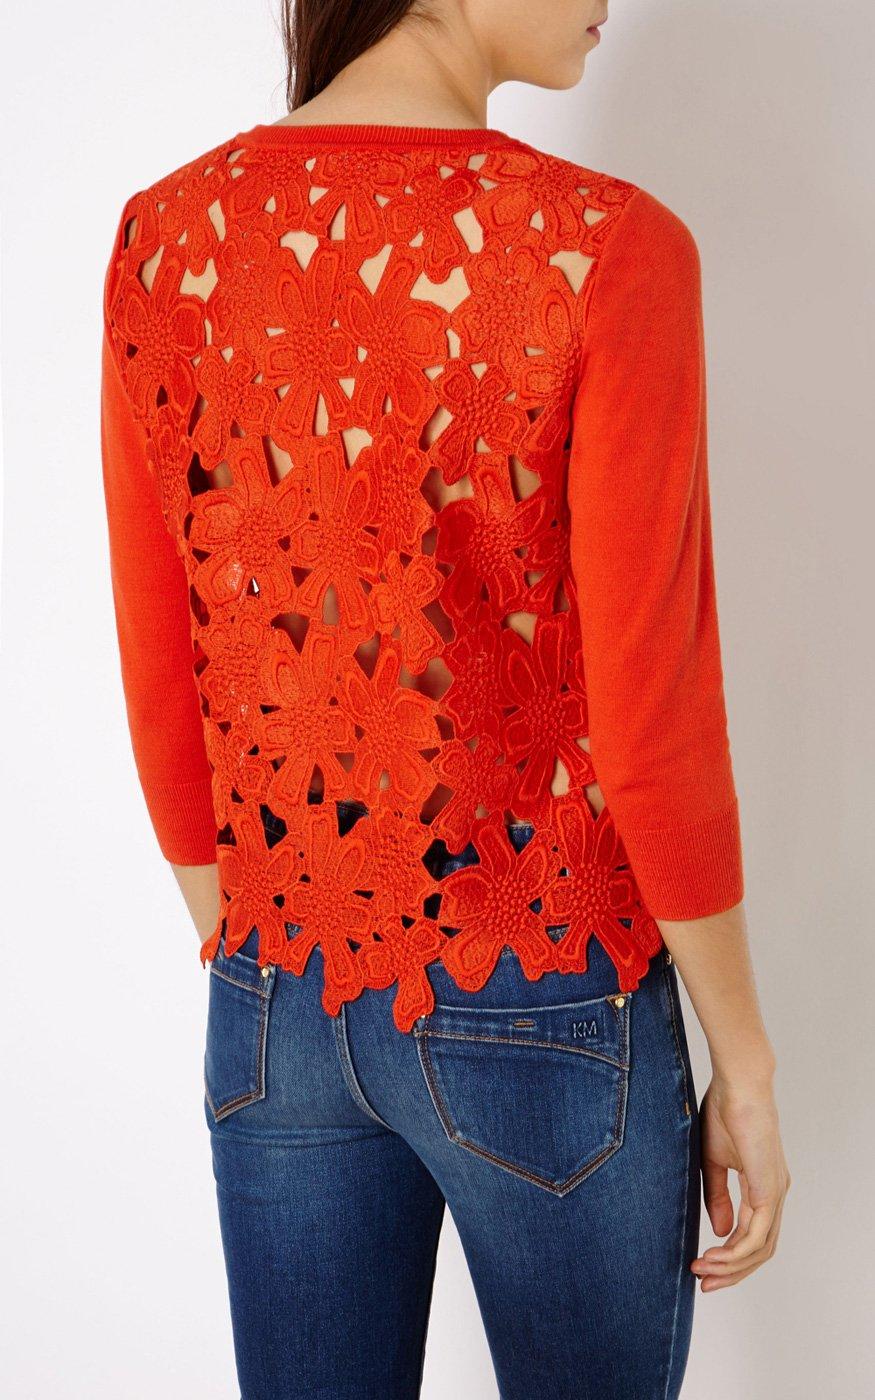 Karen millen Floral Lace Cardigan in Red | Lyst